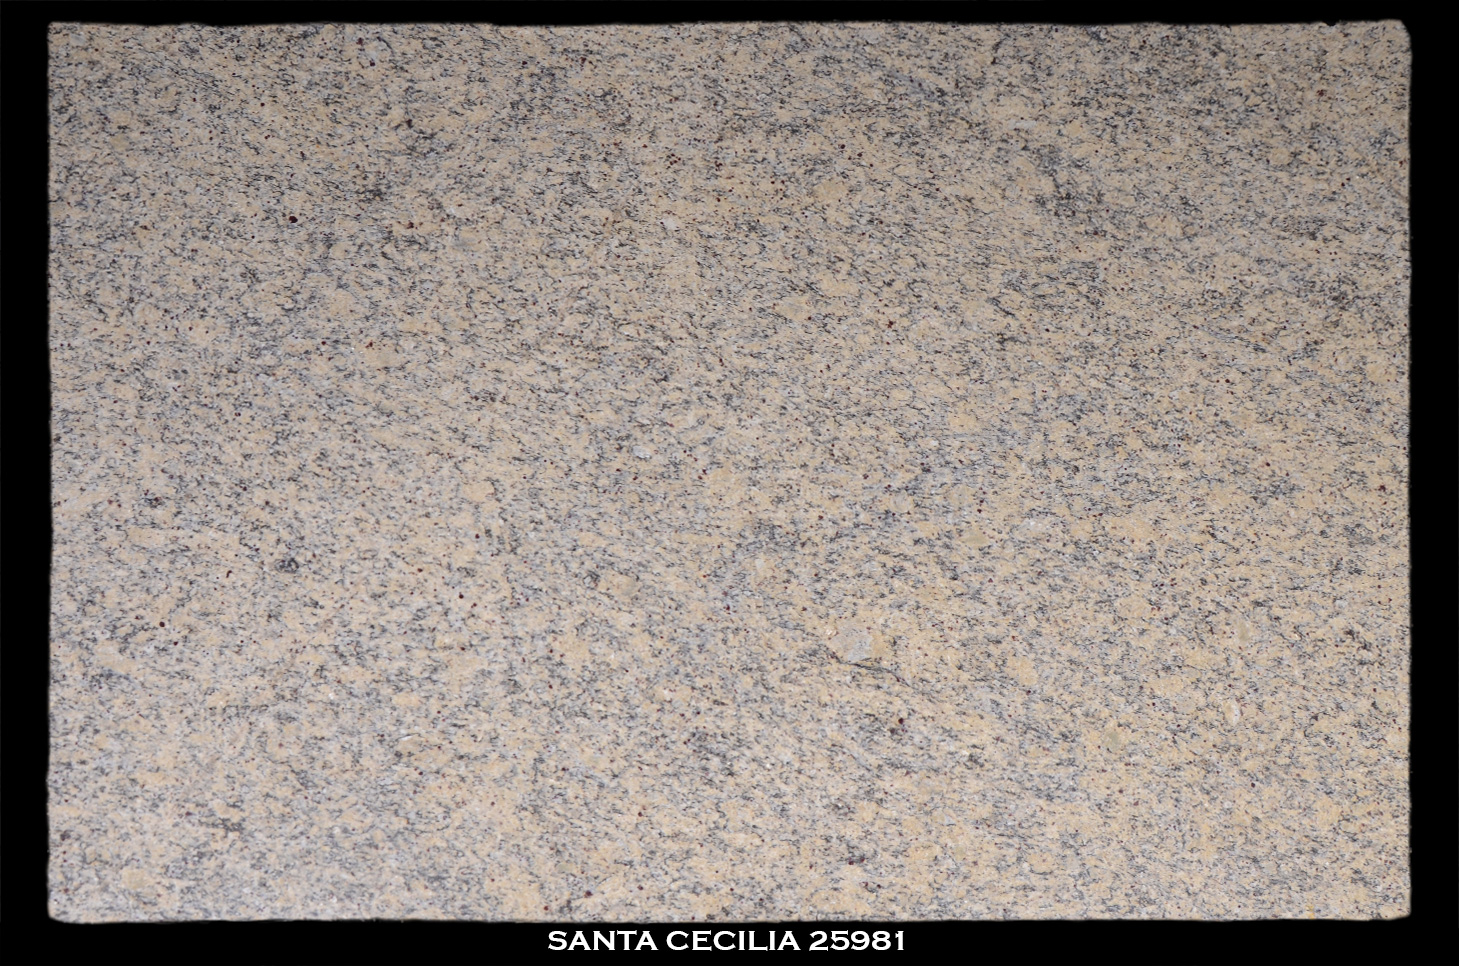 SANTA-CECILIA-25981-SLAB